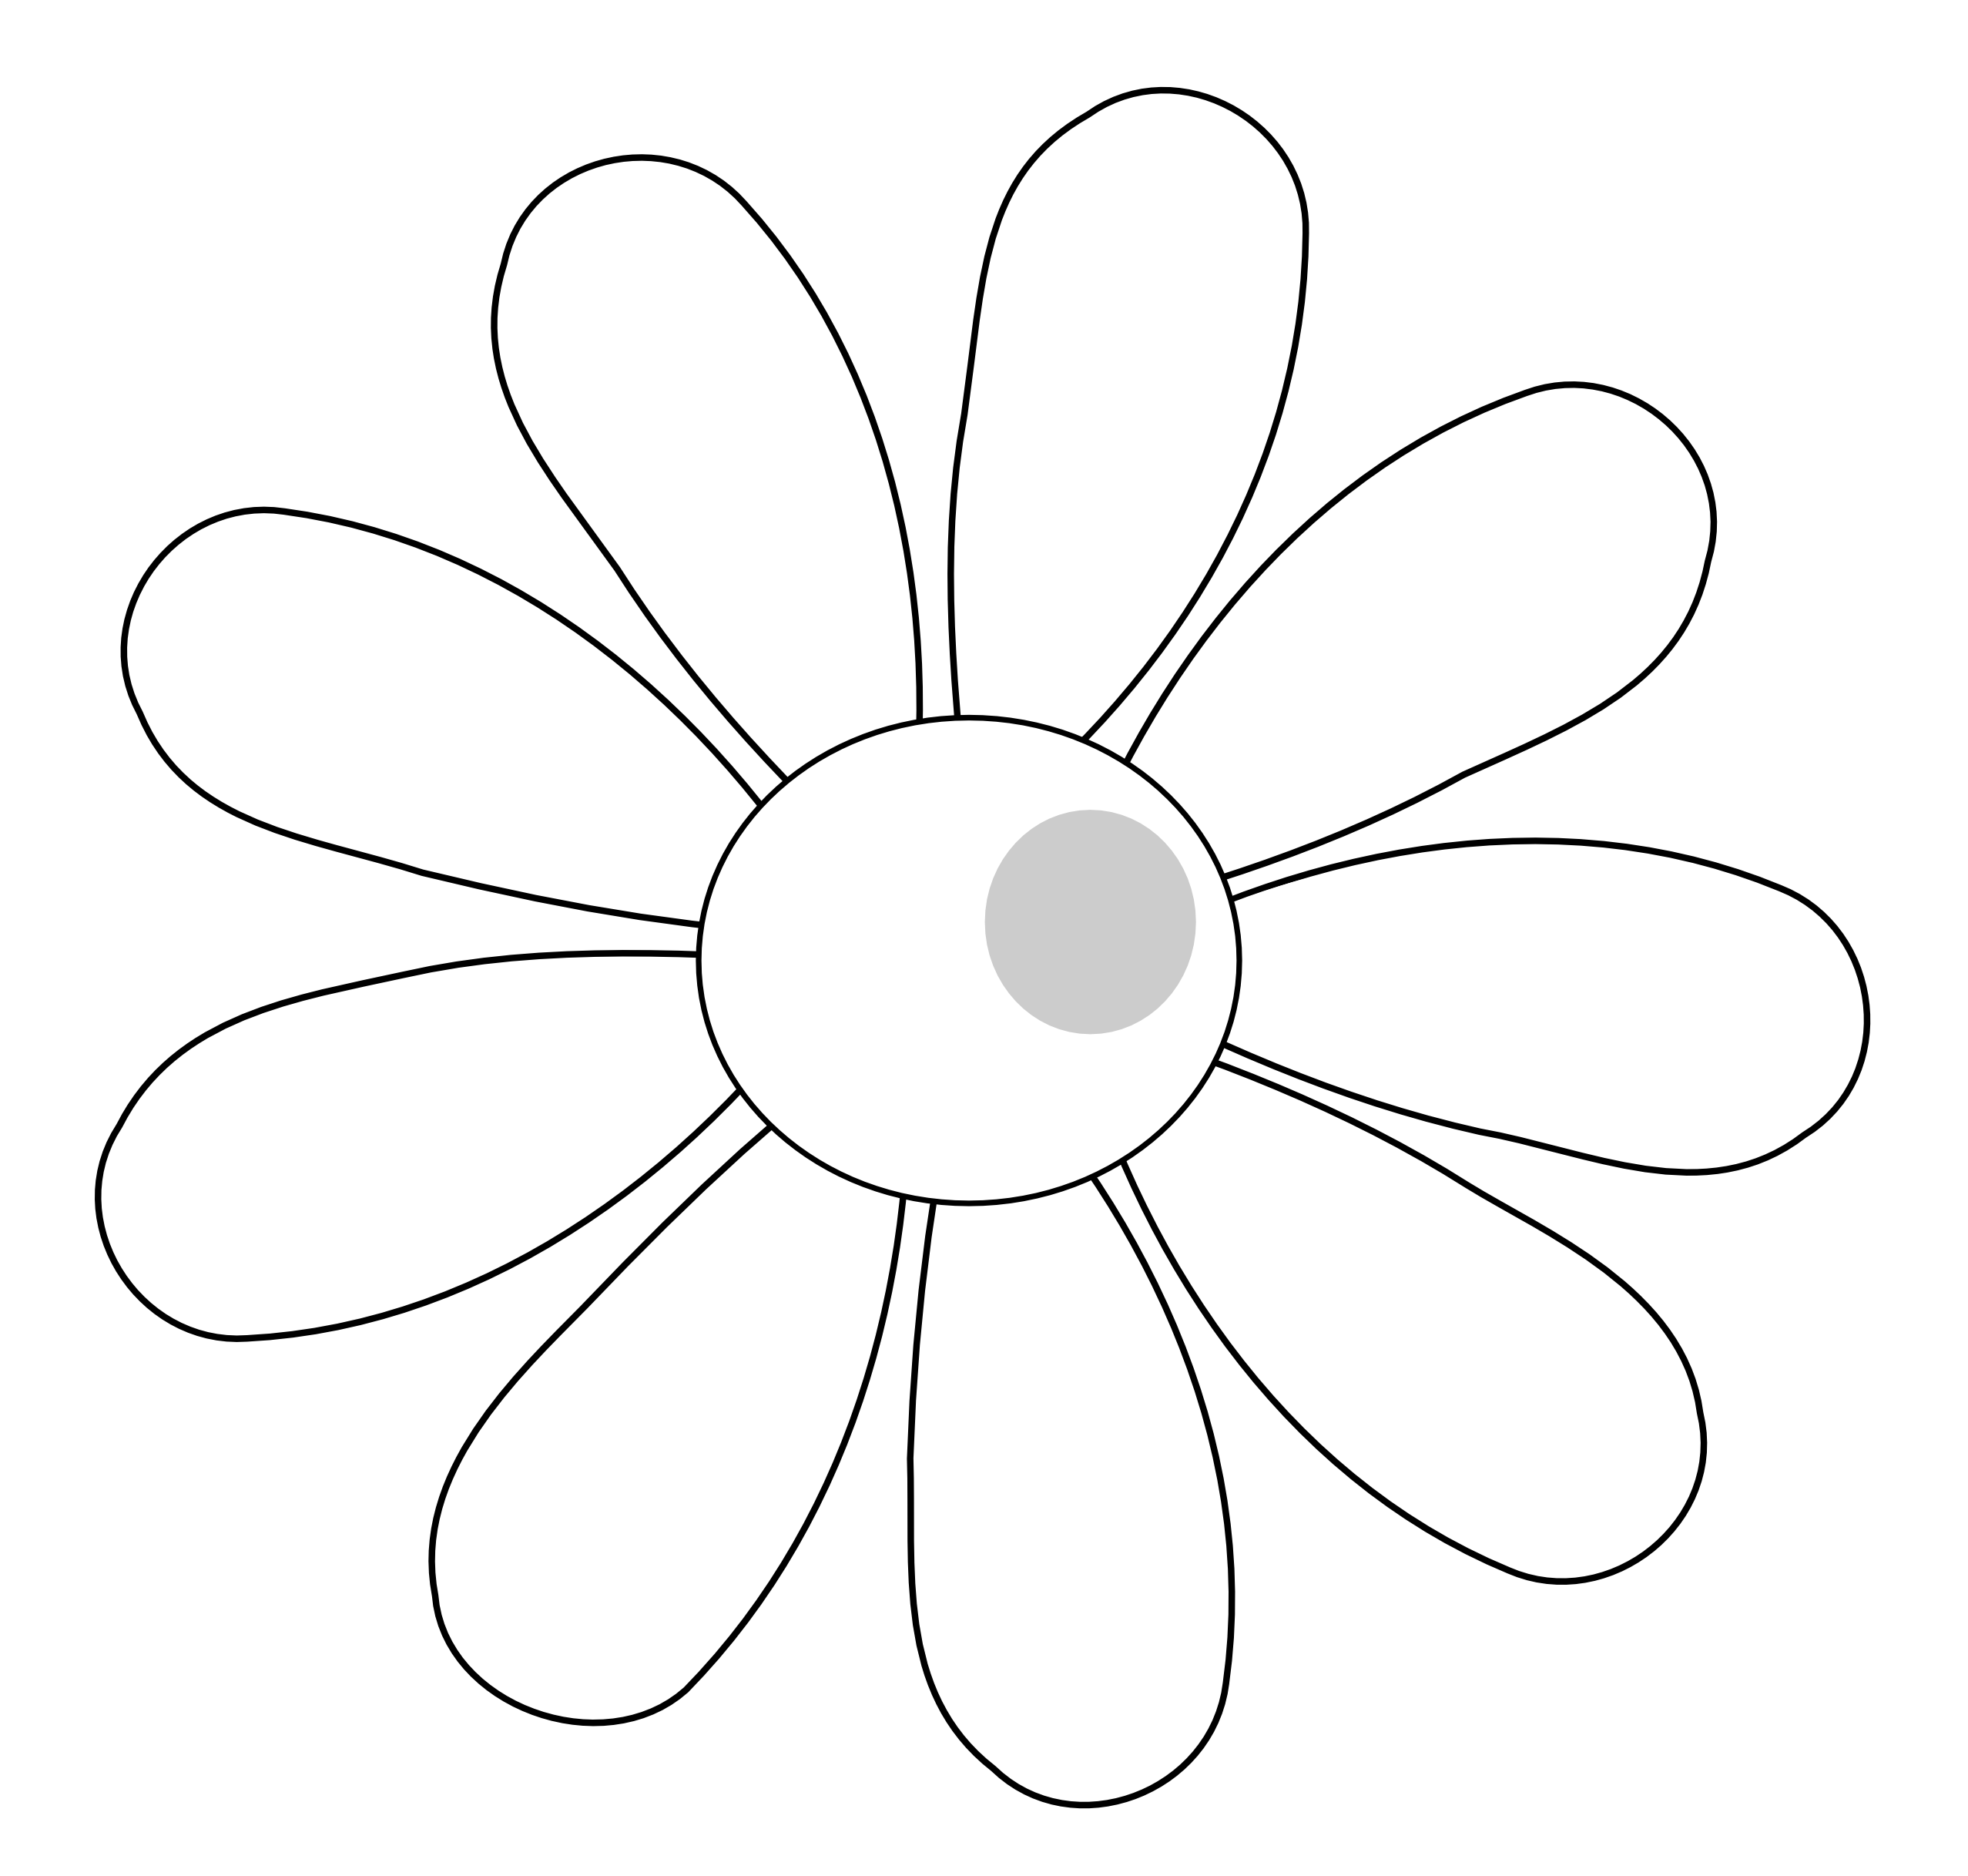 Daisy Flower 7 Black White Line Art Scalable Vector Graphics Svg Clipart Best Clipart Best Flower Clipart Daisy Image Clip Art